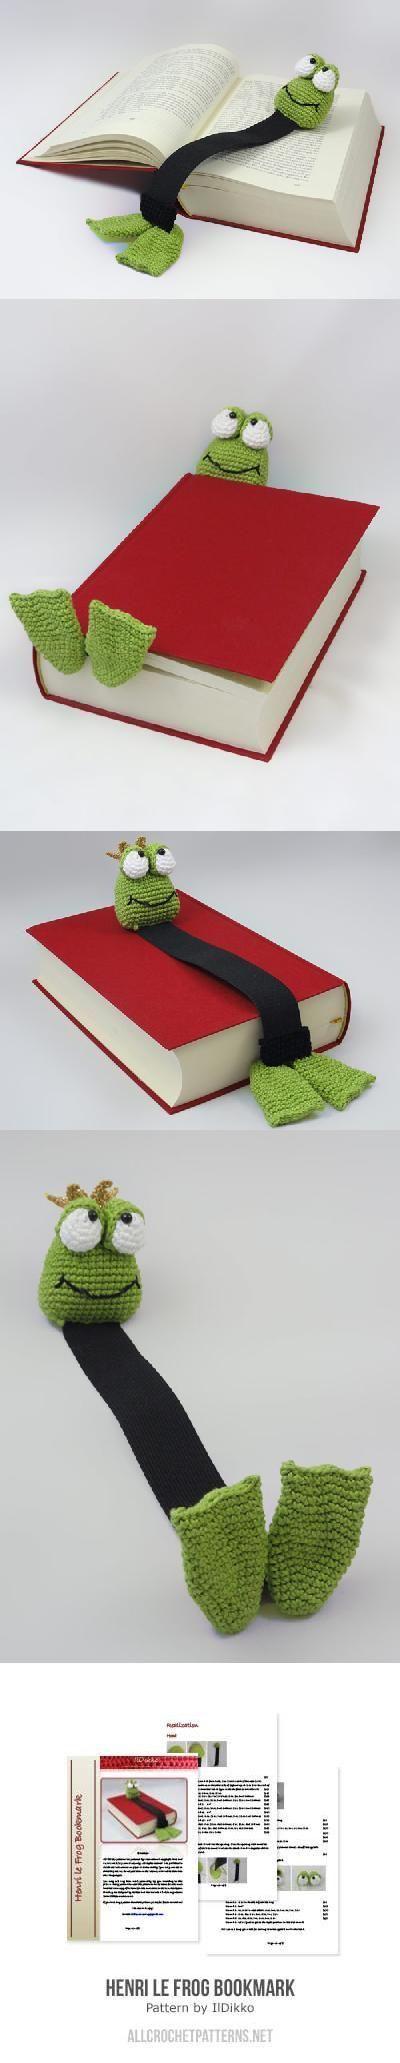 Henri Le Frog Bookmark Crochet Pattern                                          …